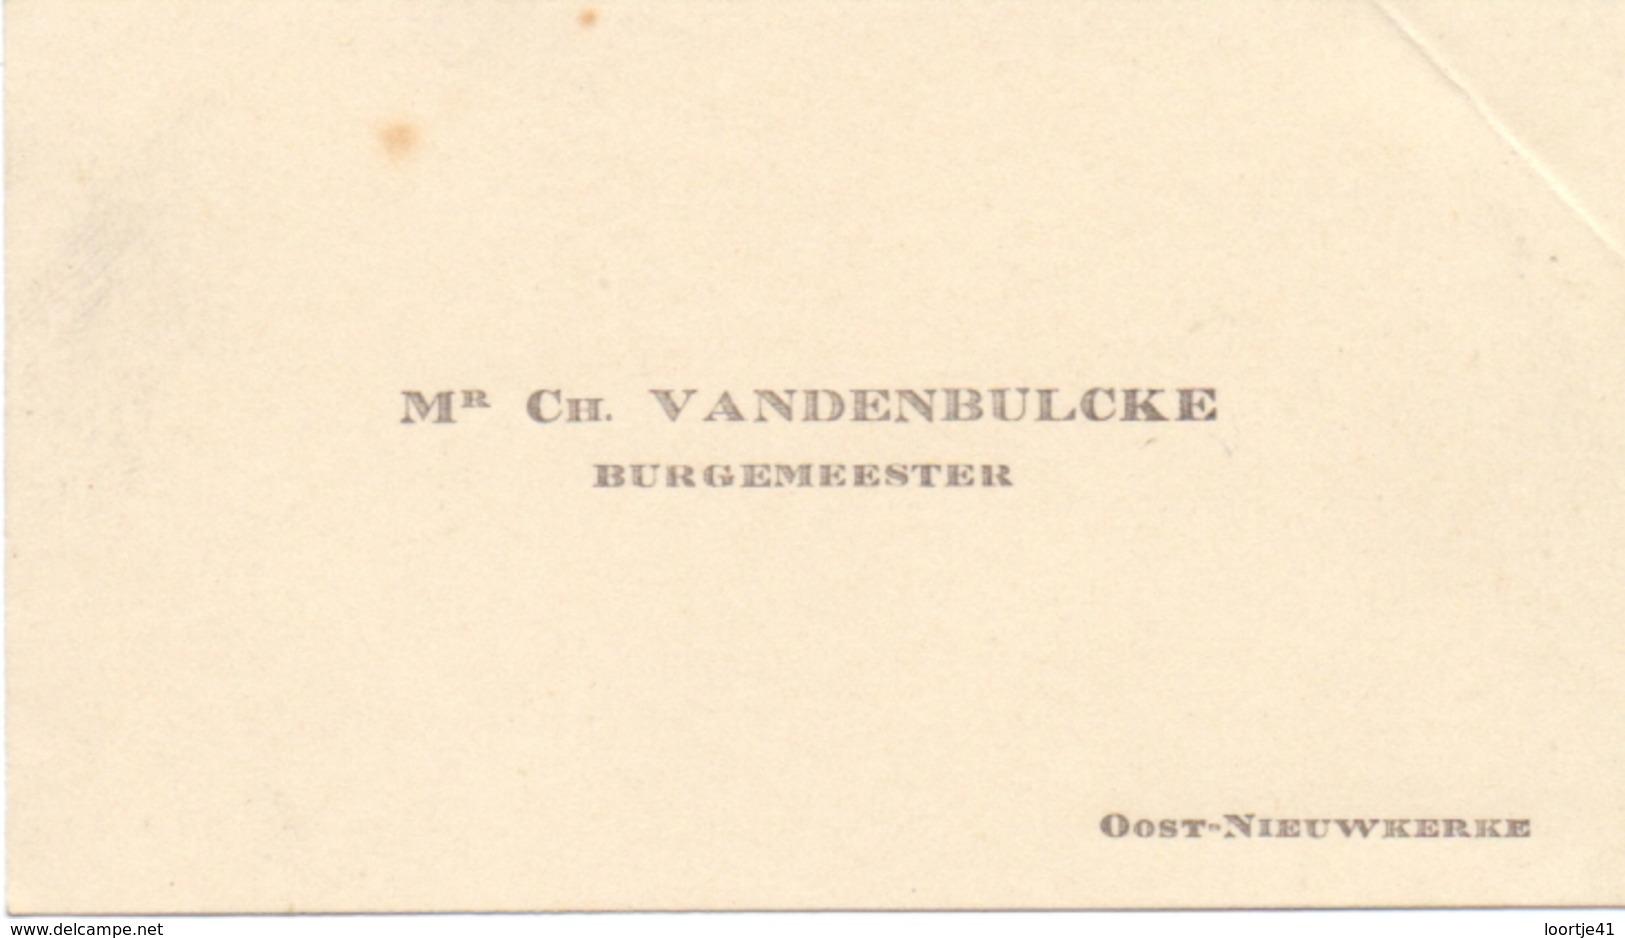 Visitekaartje - Carte Visite - Burgemeester CH. Vandenbulcke - Oostnieuwkerke - Cartes De Visite